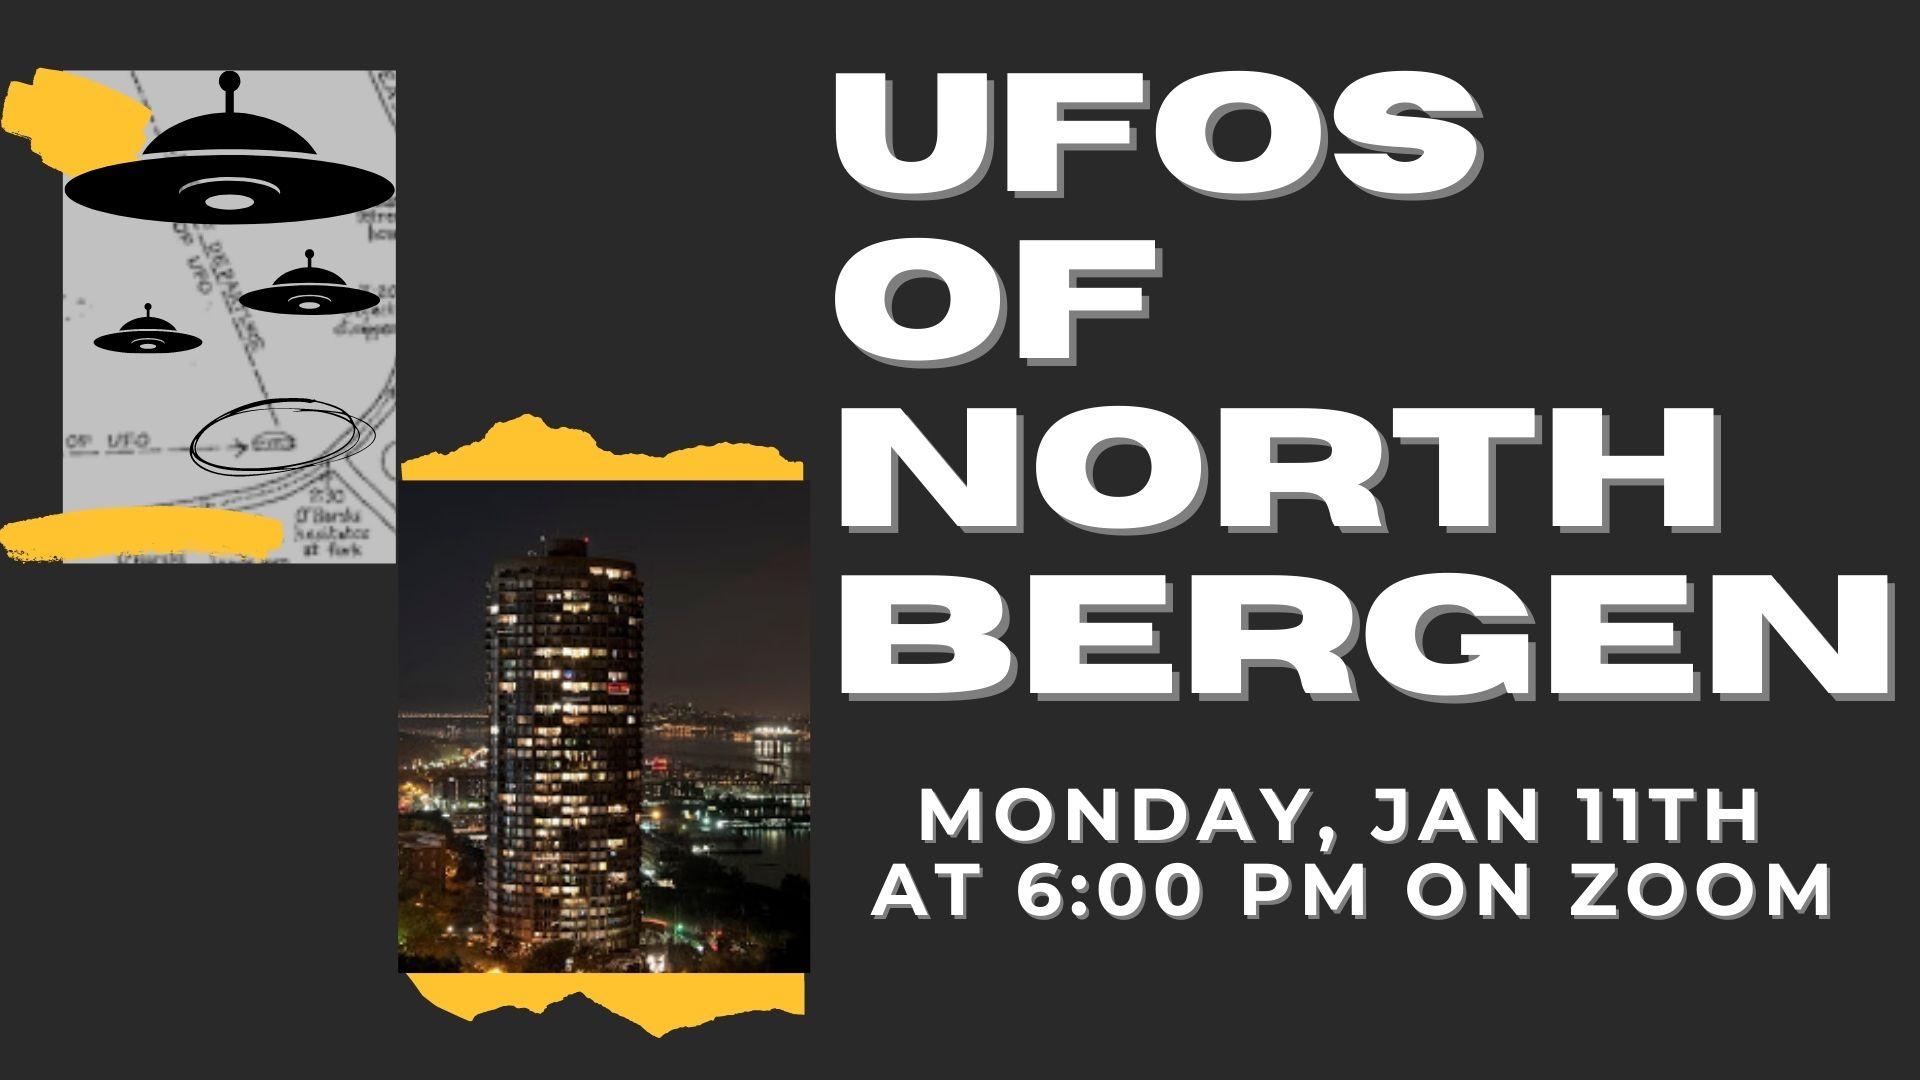 UFOs of North Bergen